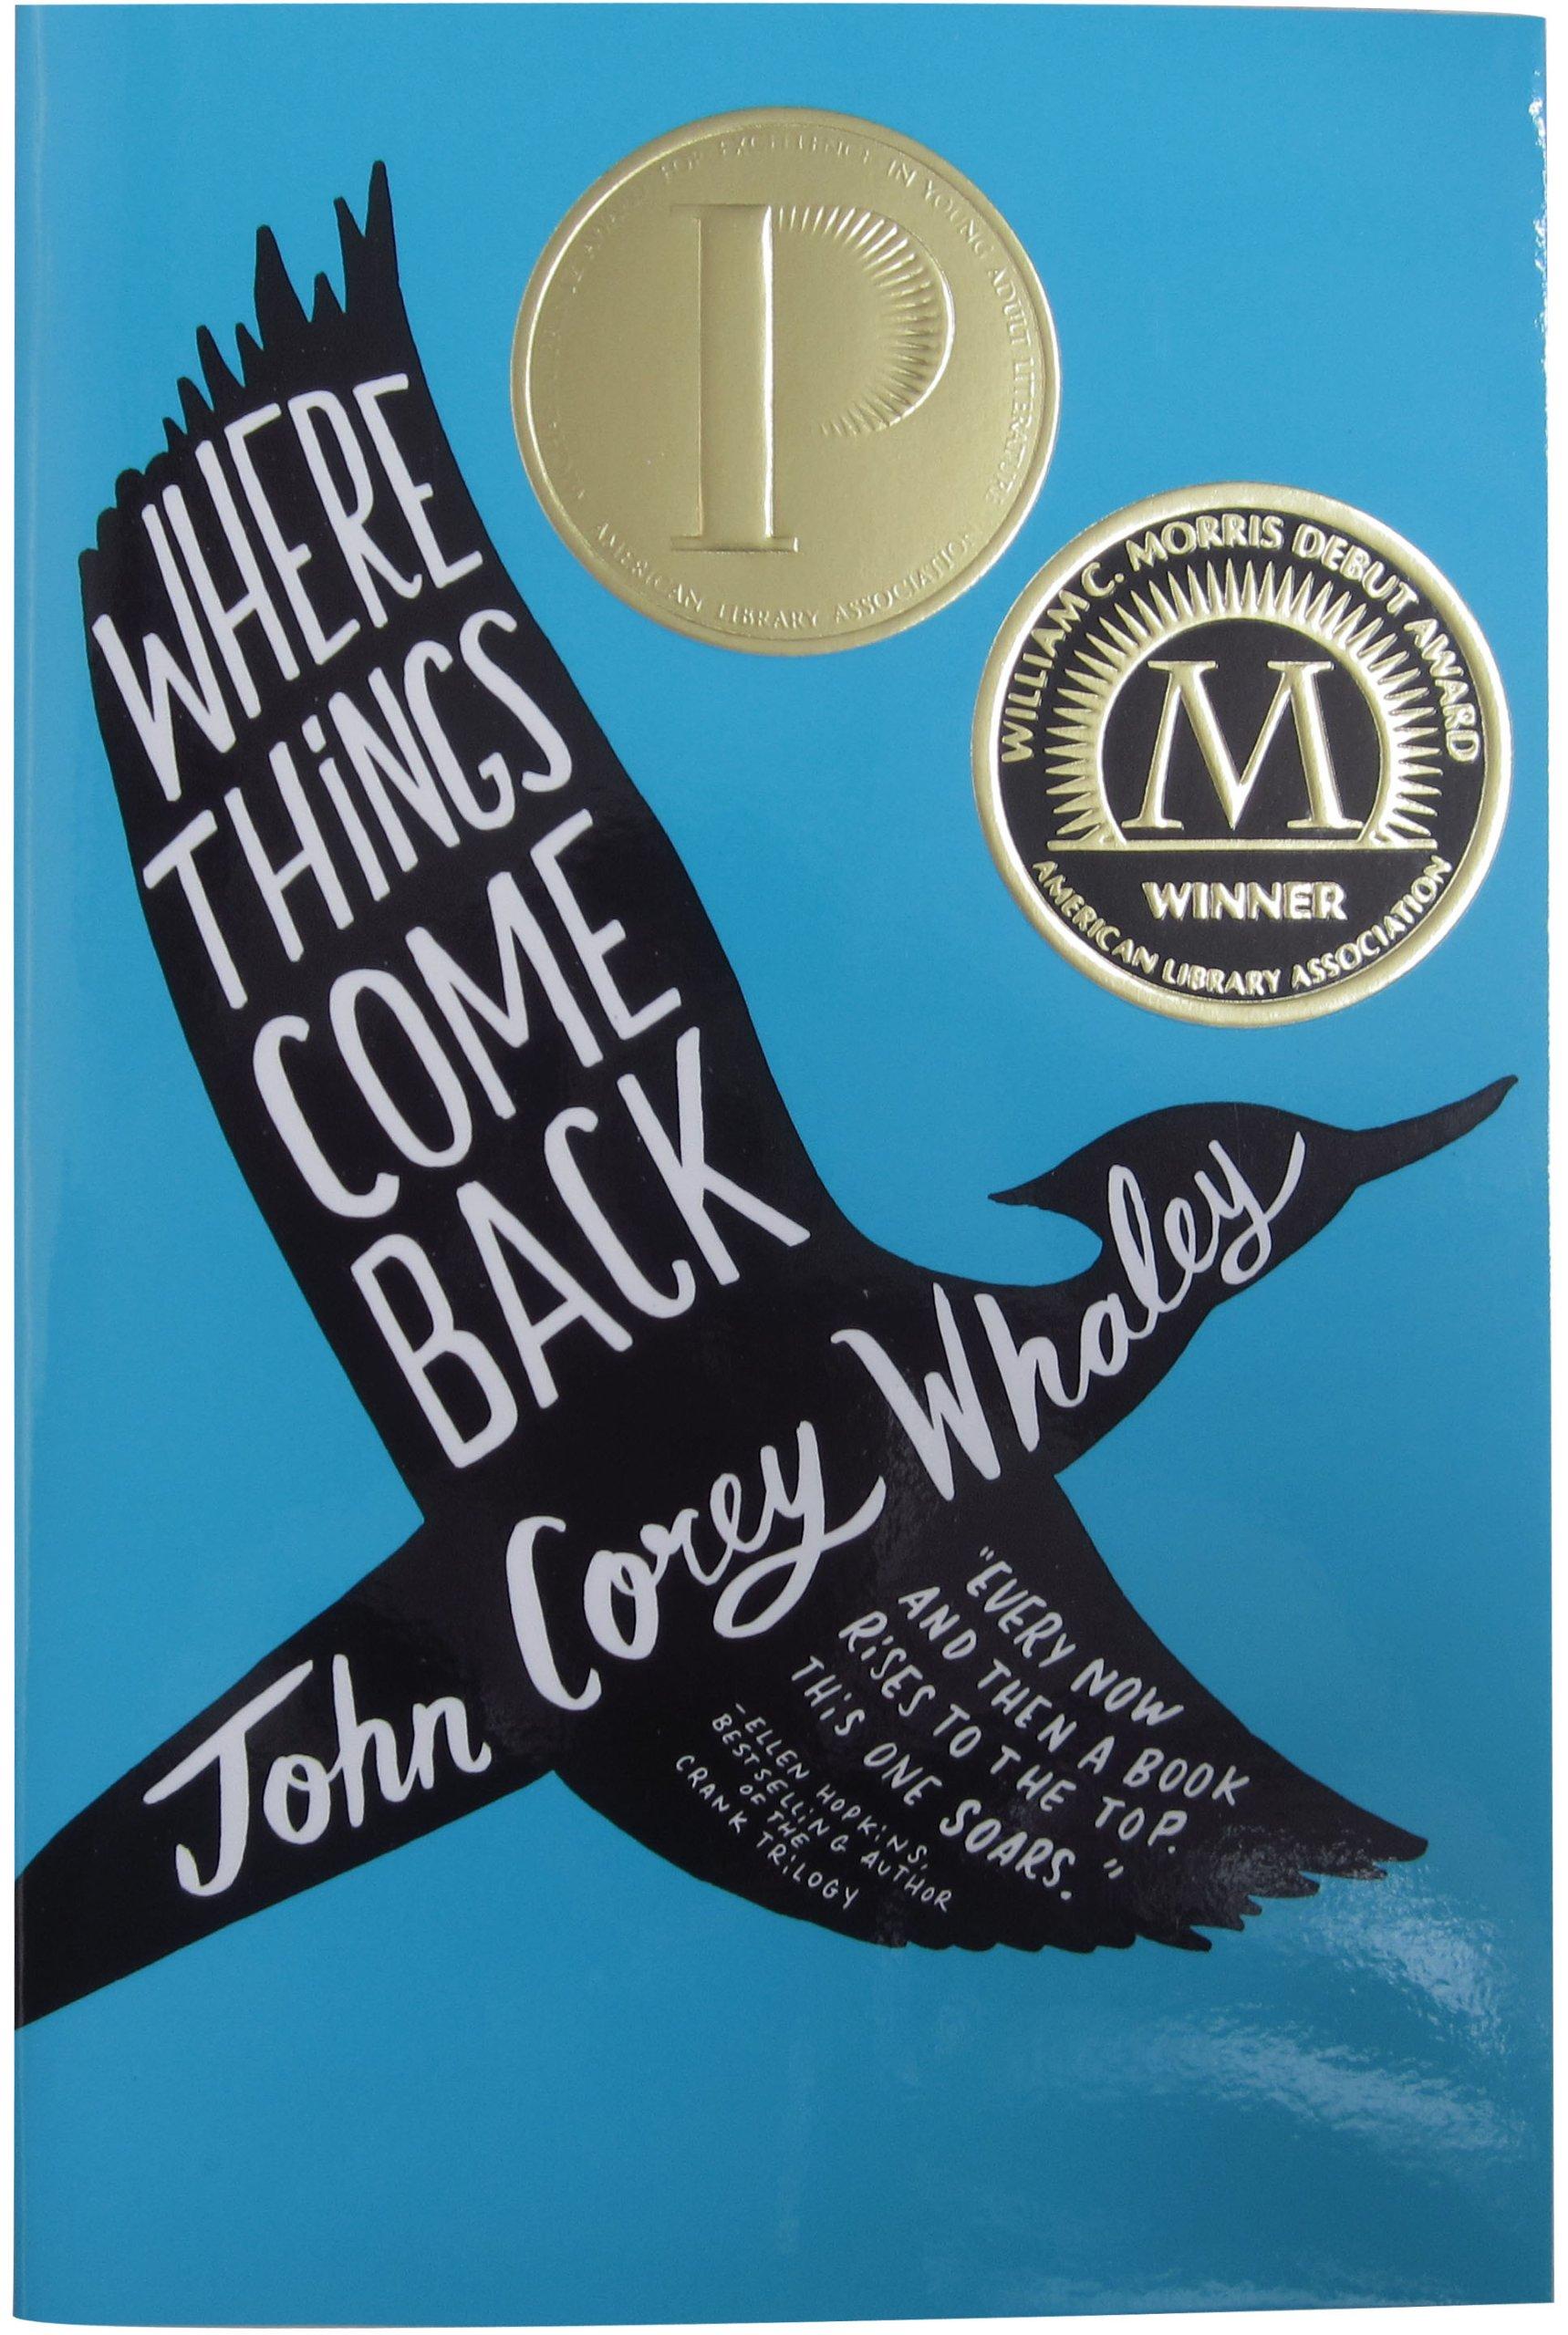 amazon com where things come back 8601419954100 john corey